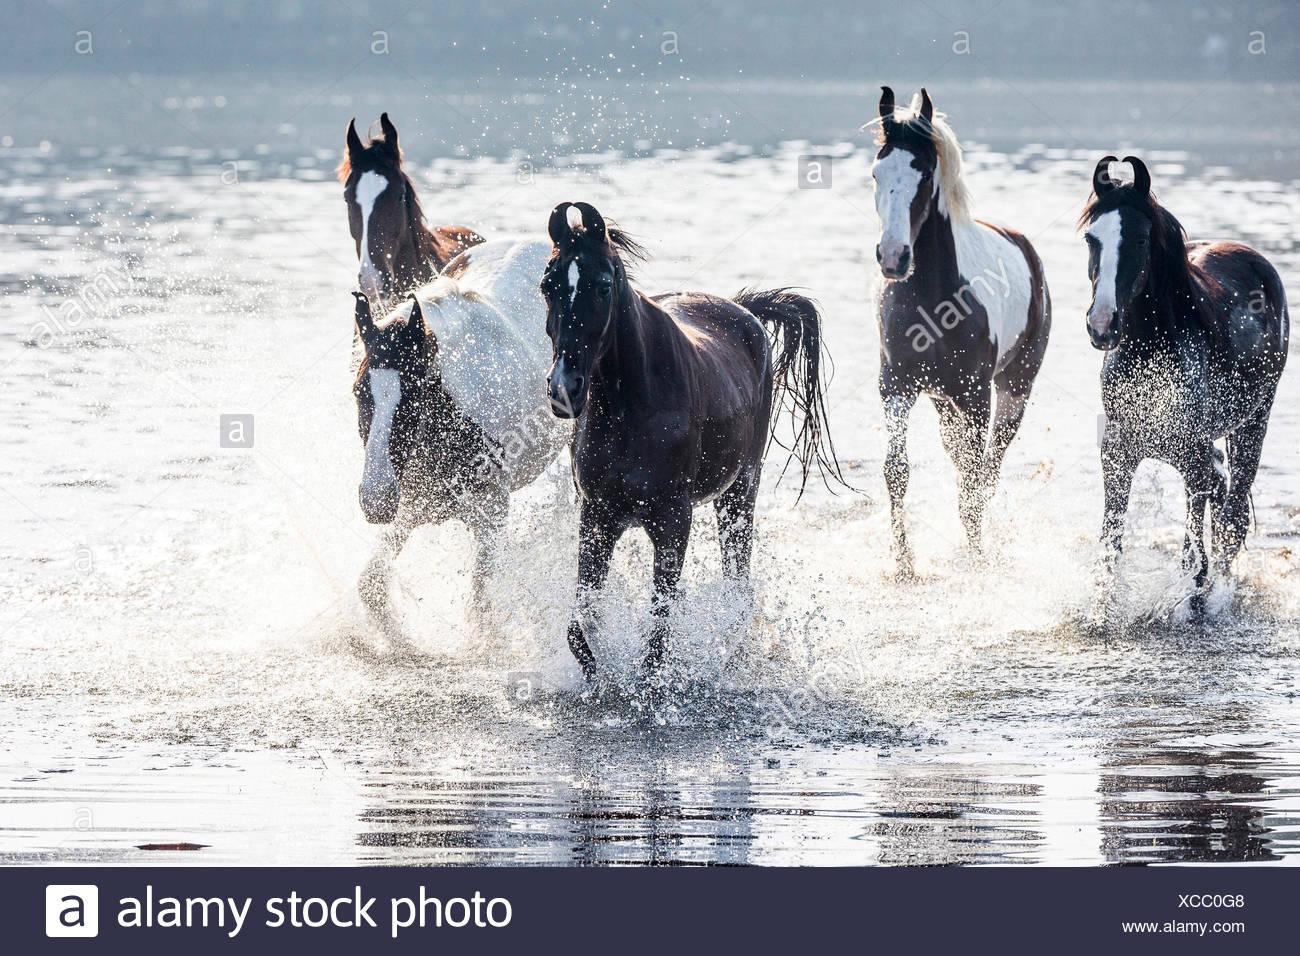 Marwari Horse. Herd of mares trotting in water. India - Stock Image